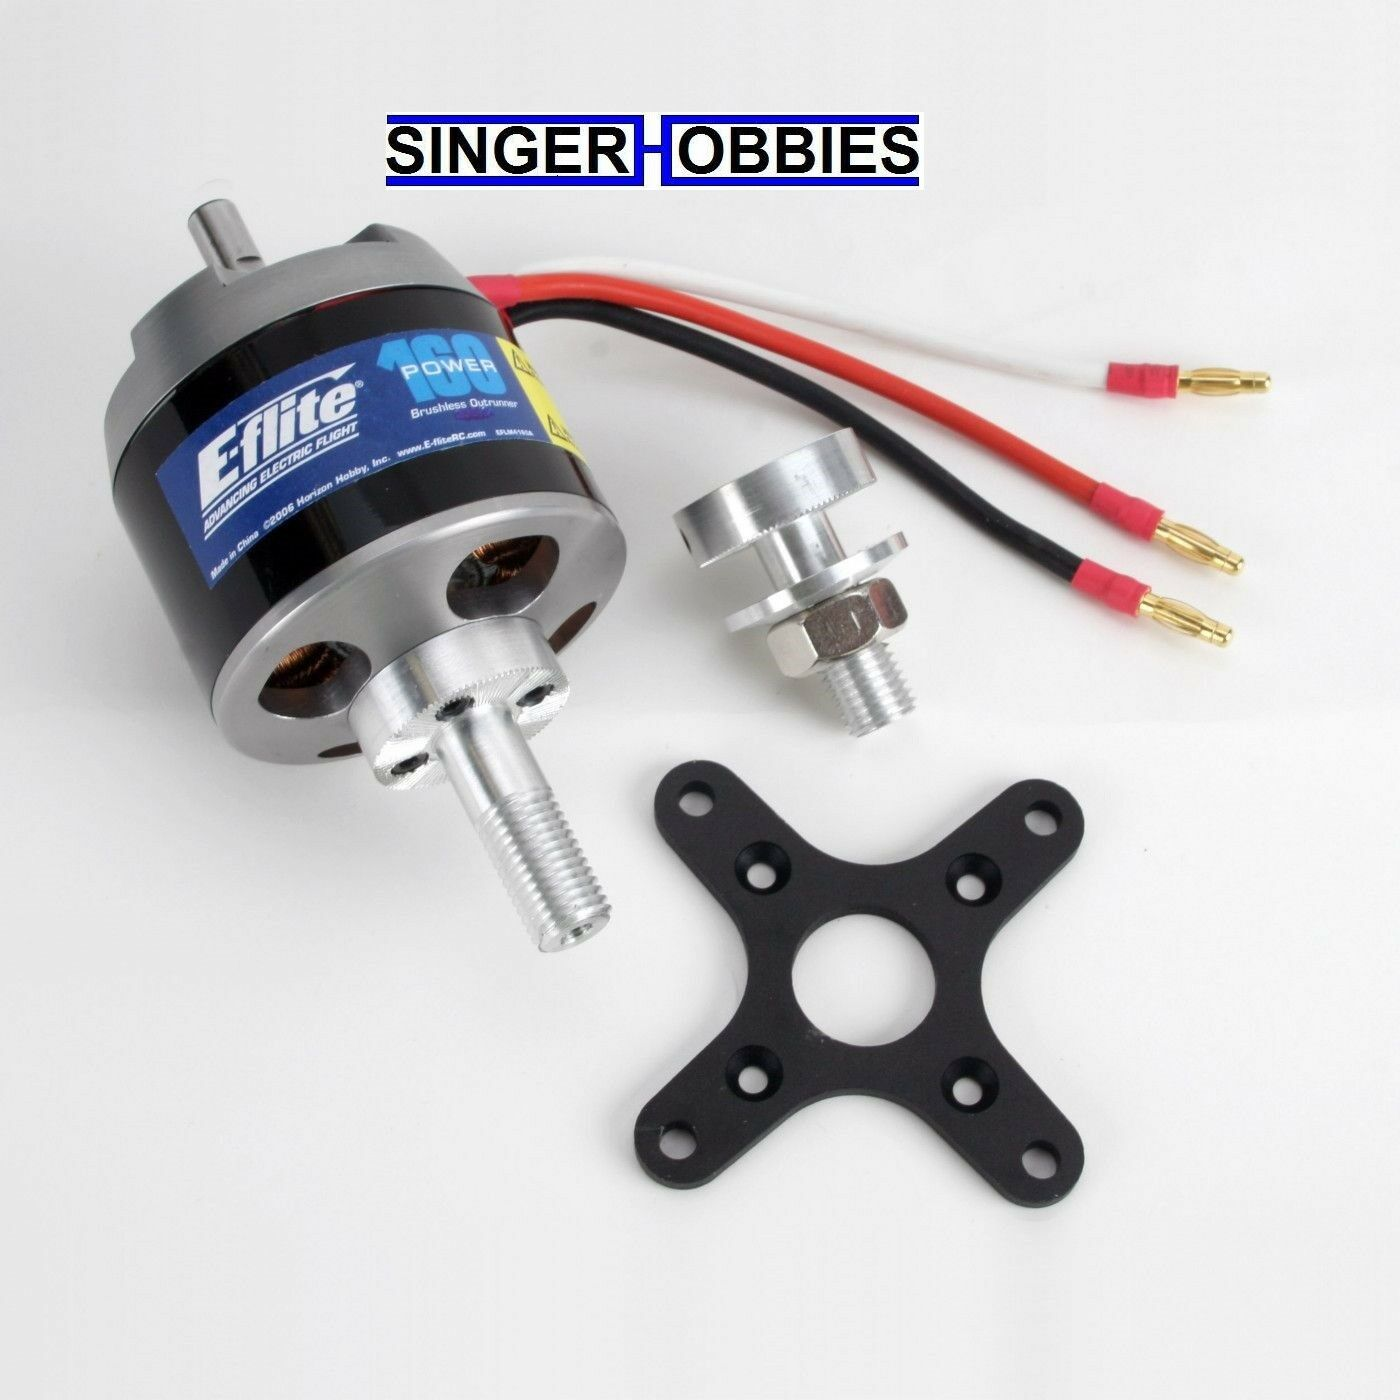 E-Flite Motor Sin Escobillas Outrunner Power 160, 245Kv EFLM 4160A Hh